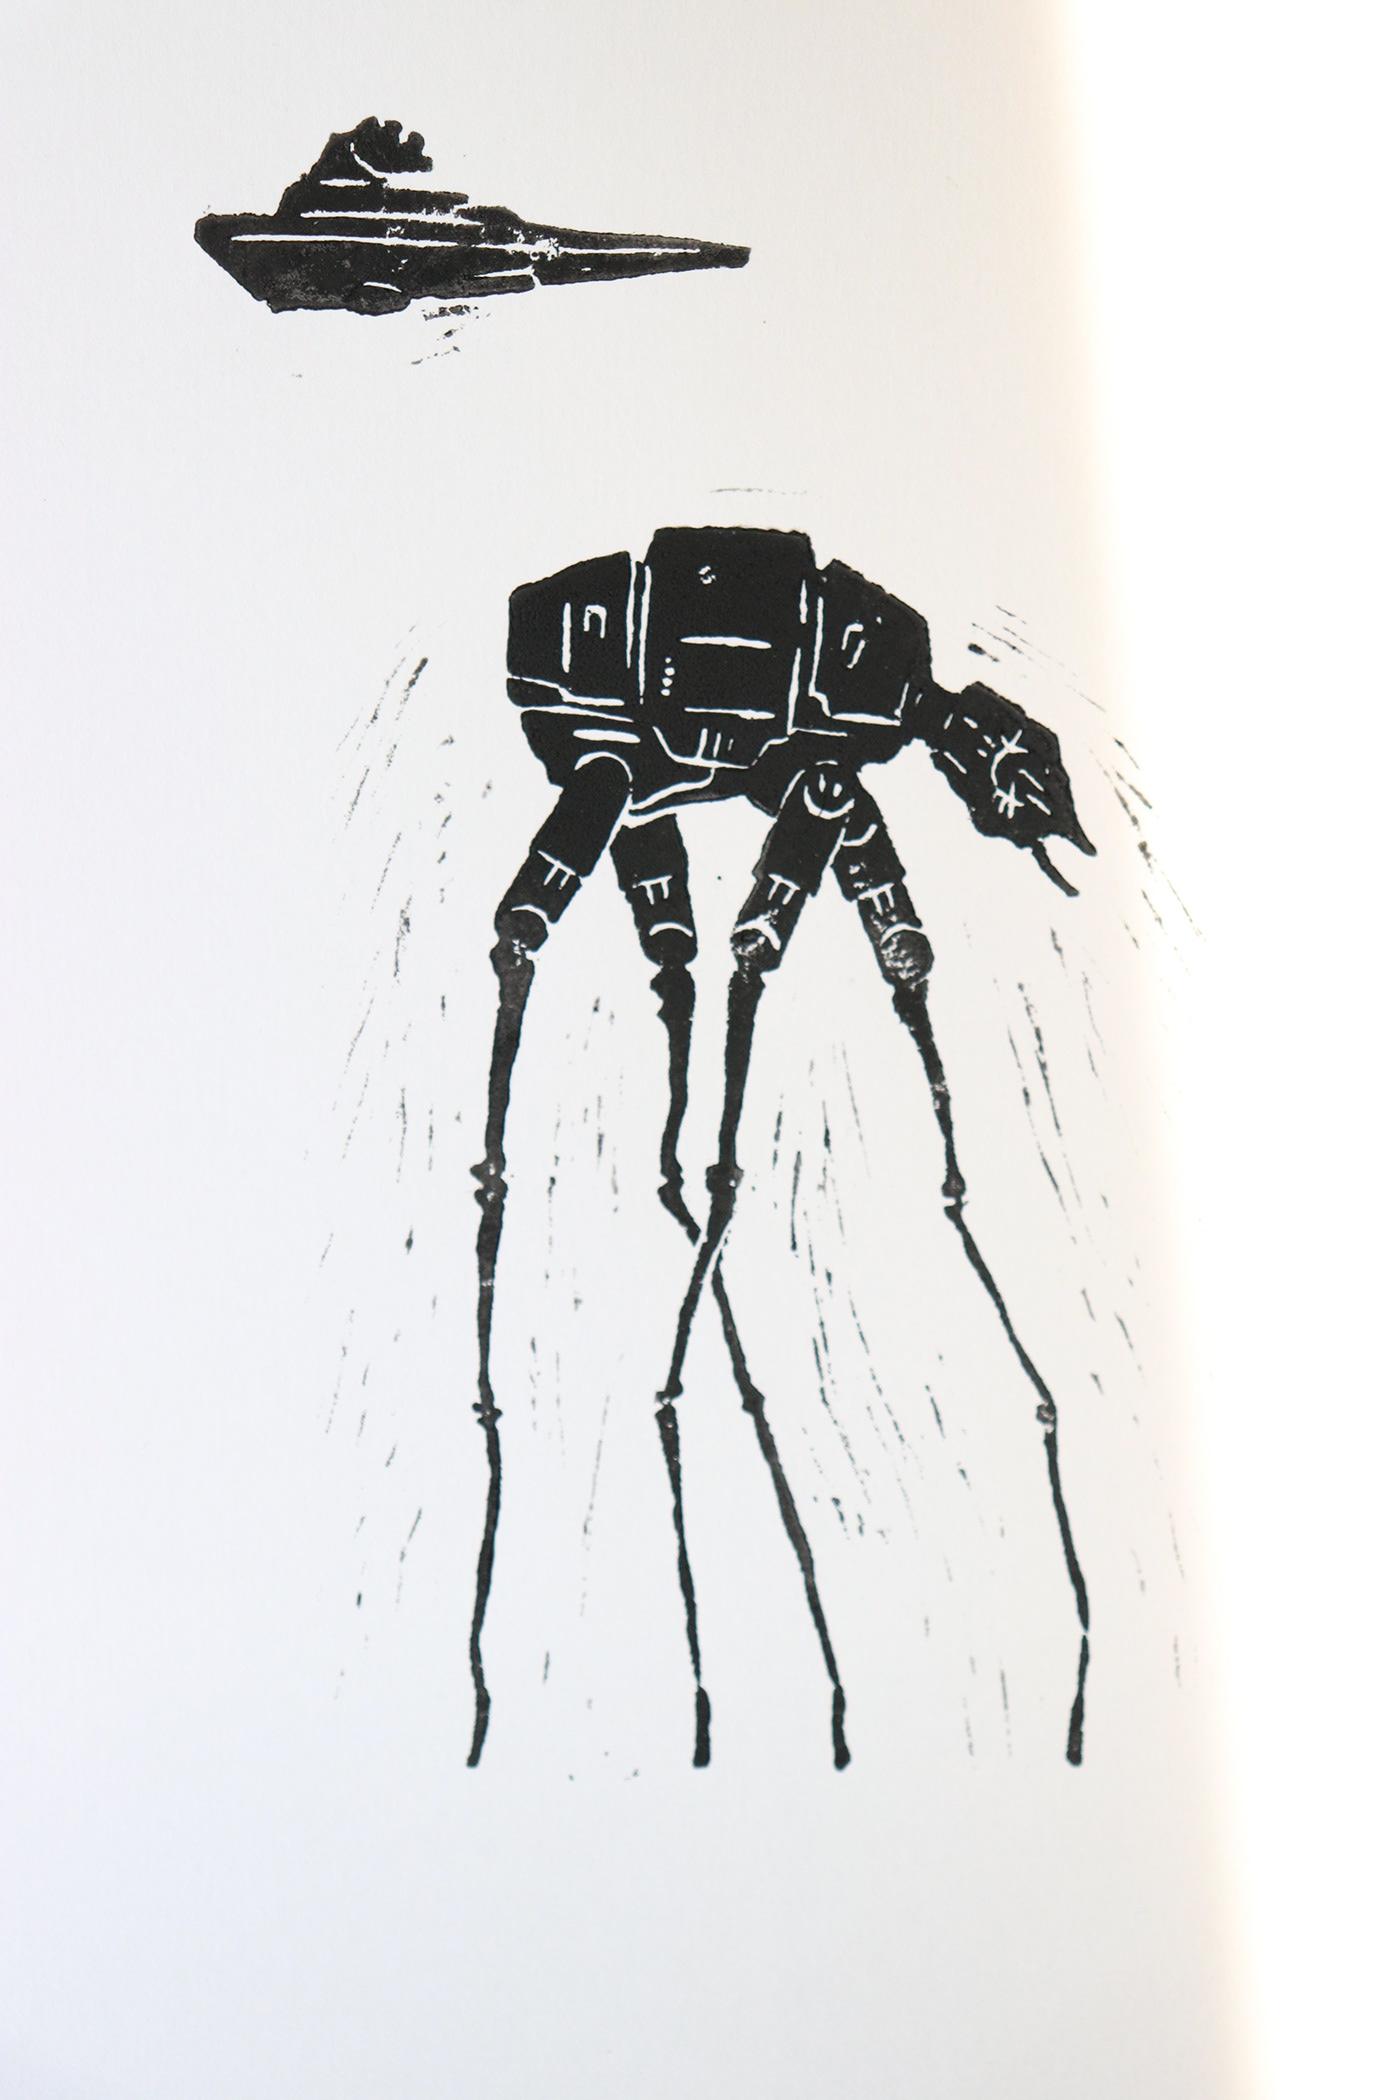 linoleum linocut ink star wars dali salvador yakaspectrum yaka art fine art